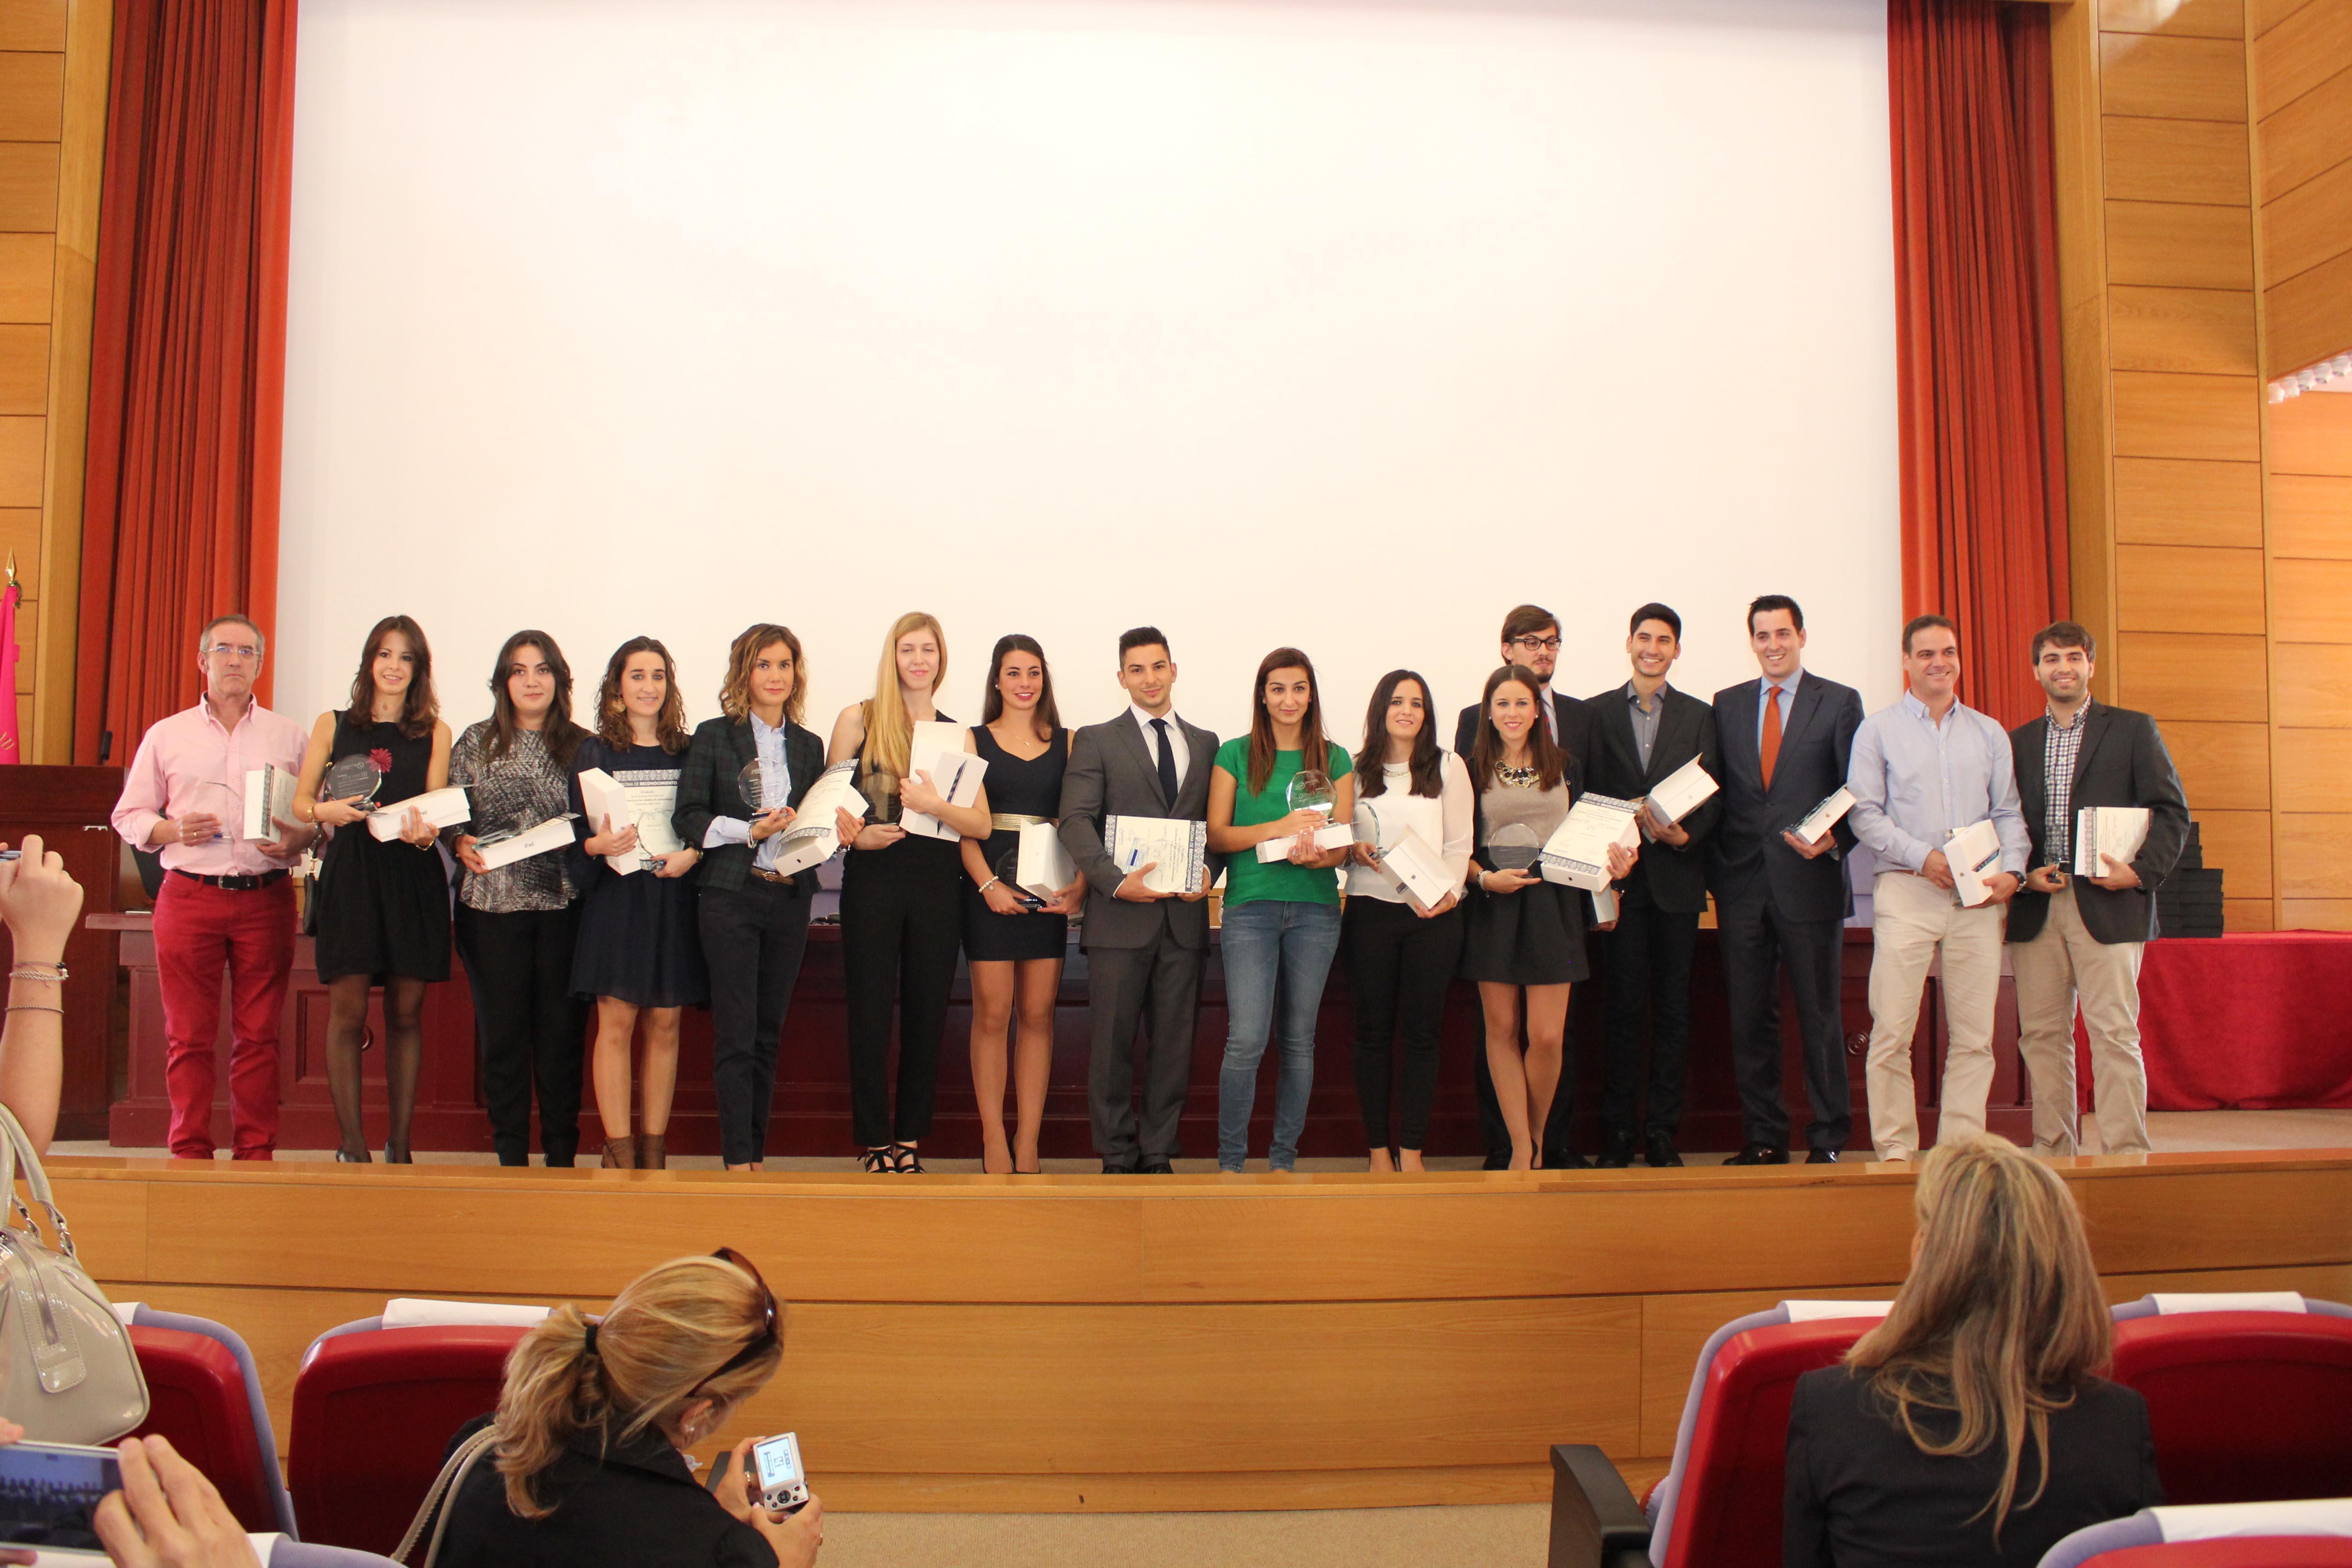 Premios a la Excelencia Proclinic 2014